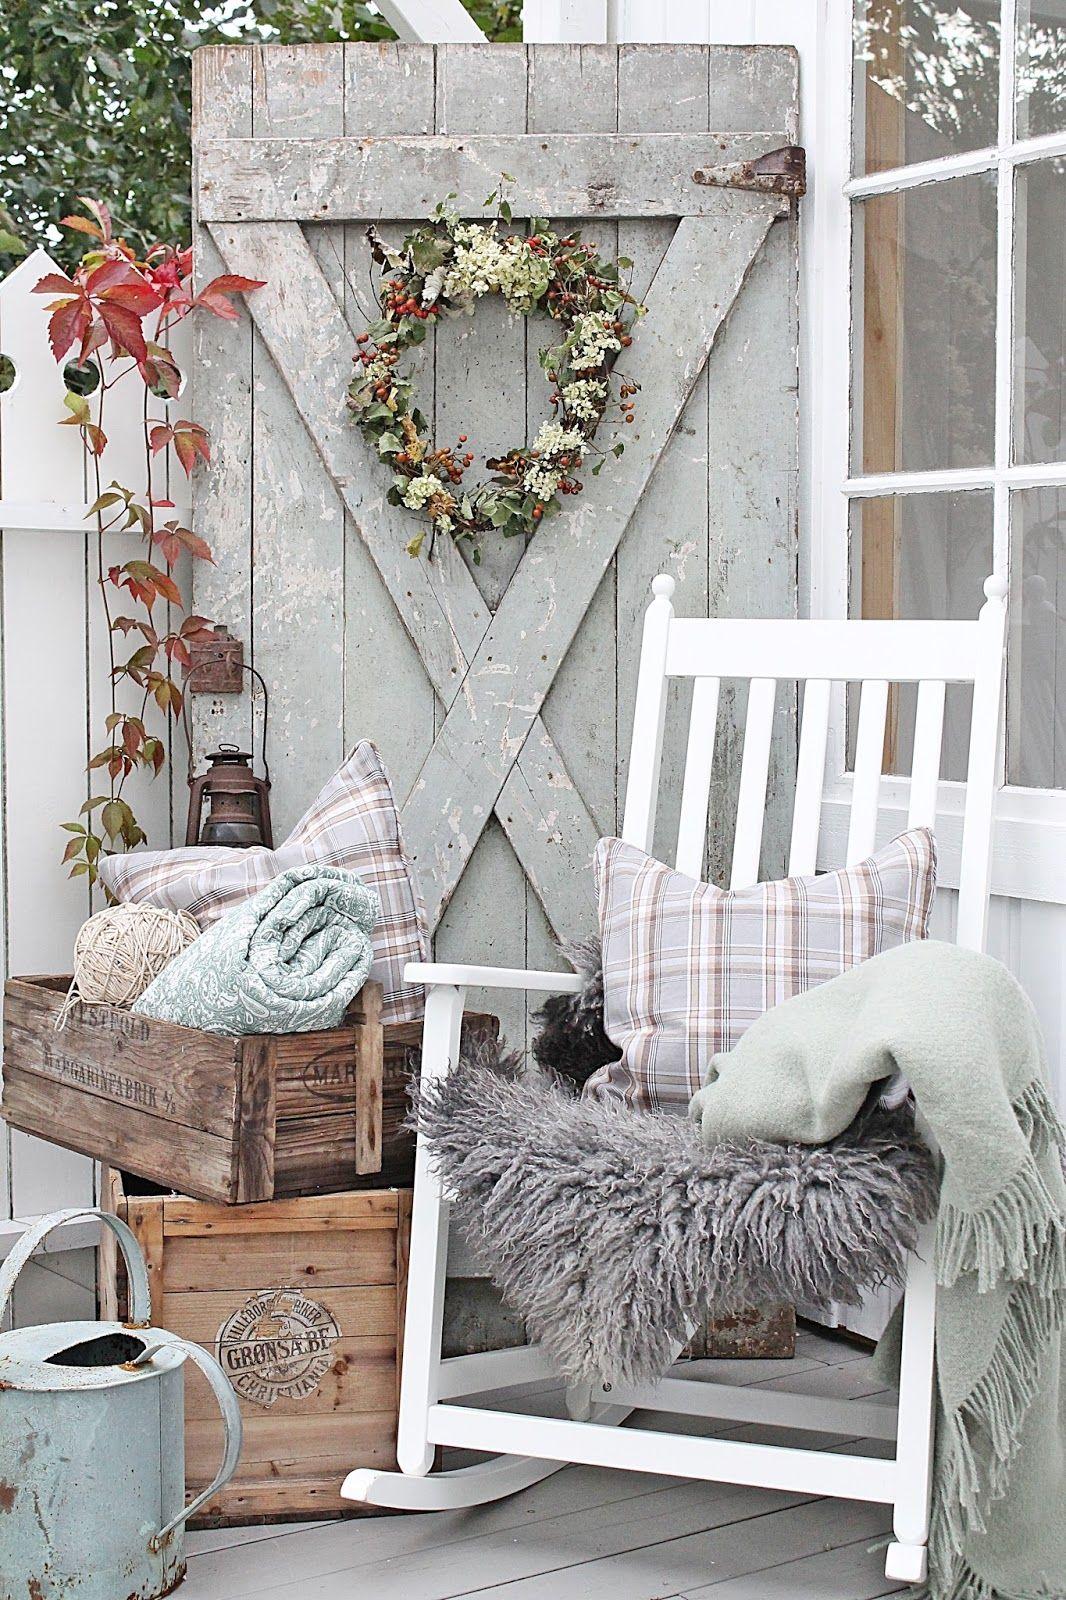 Cozy vignette with a wooden door, wreath, crates, rocking chair ...